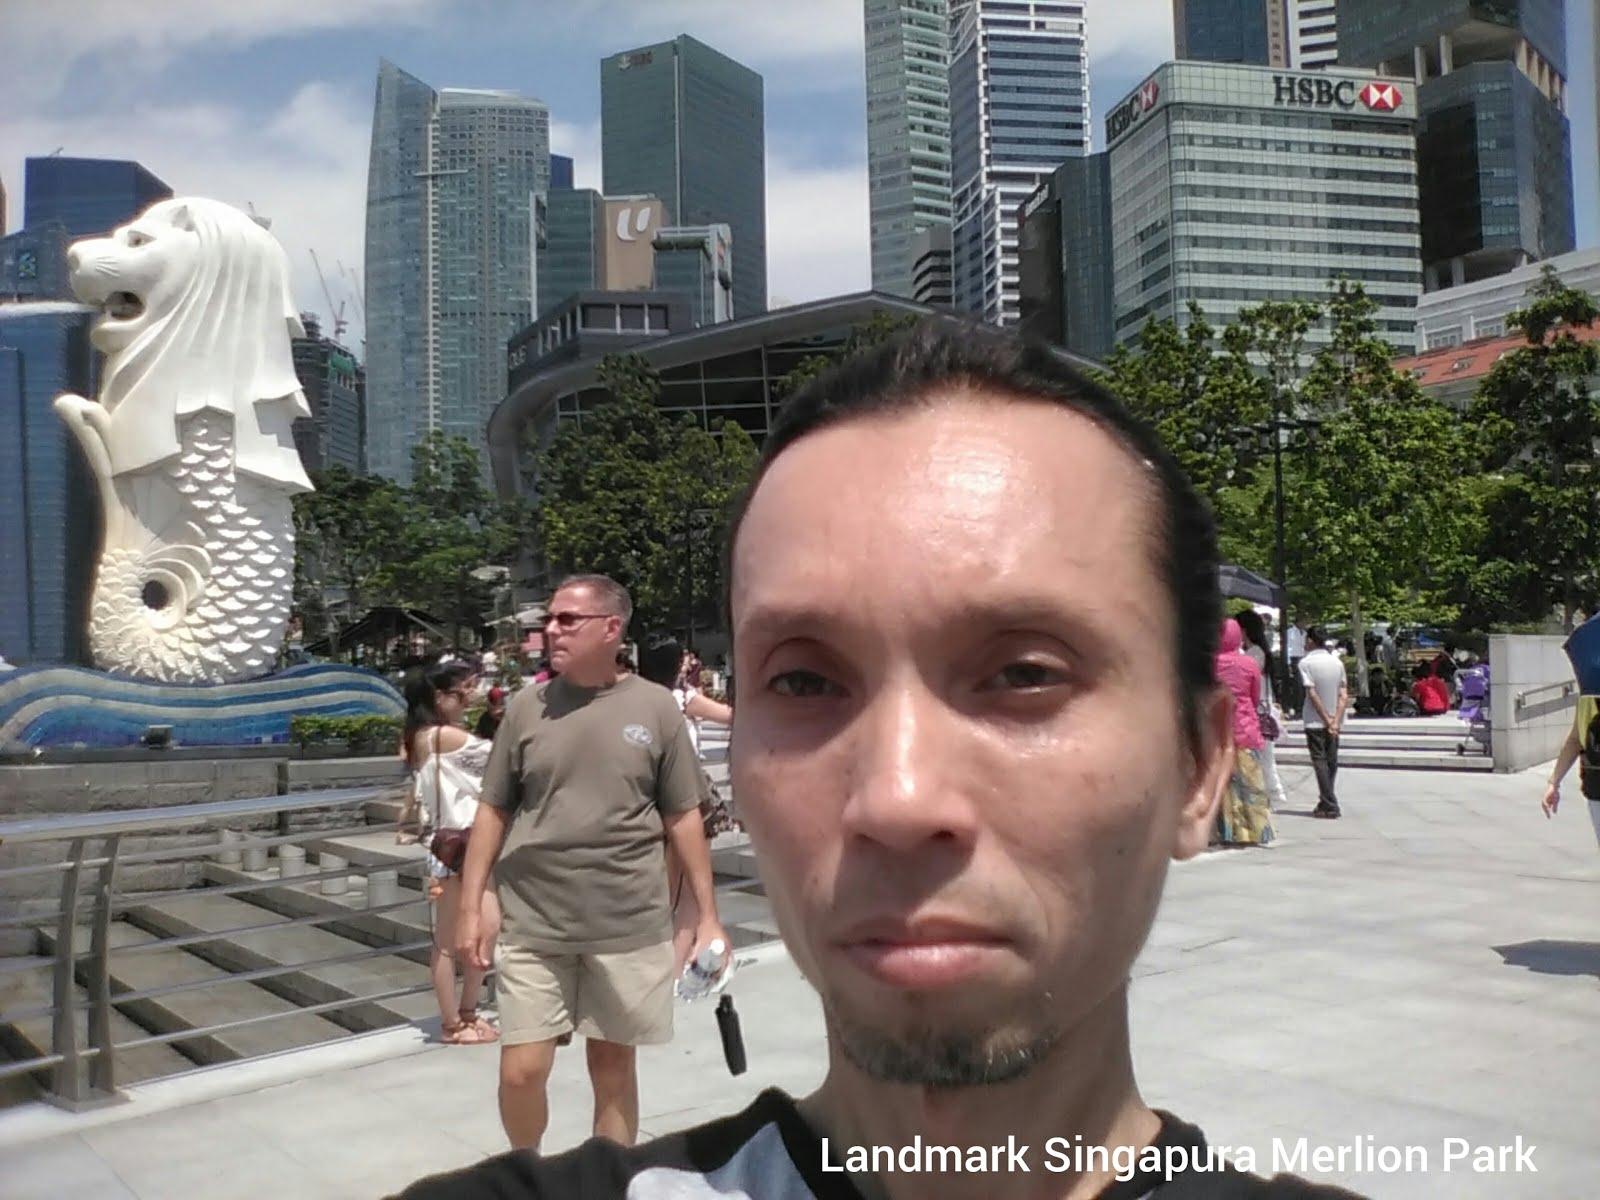 SELFIE DI MERLION PARK SINGAPORE